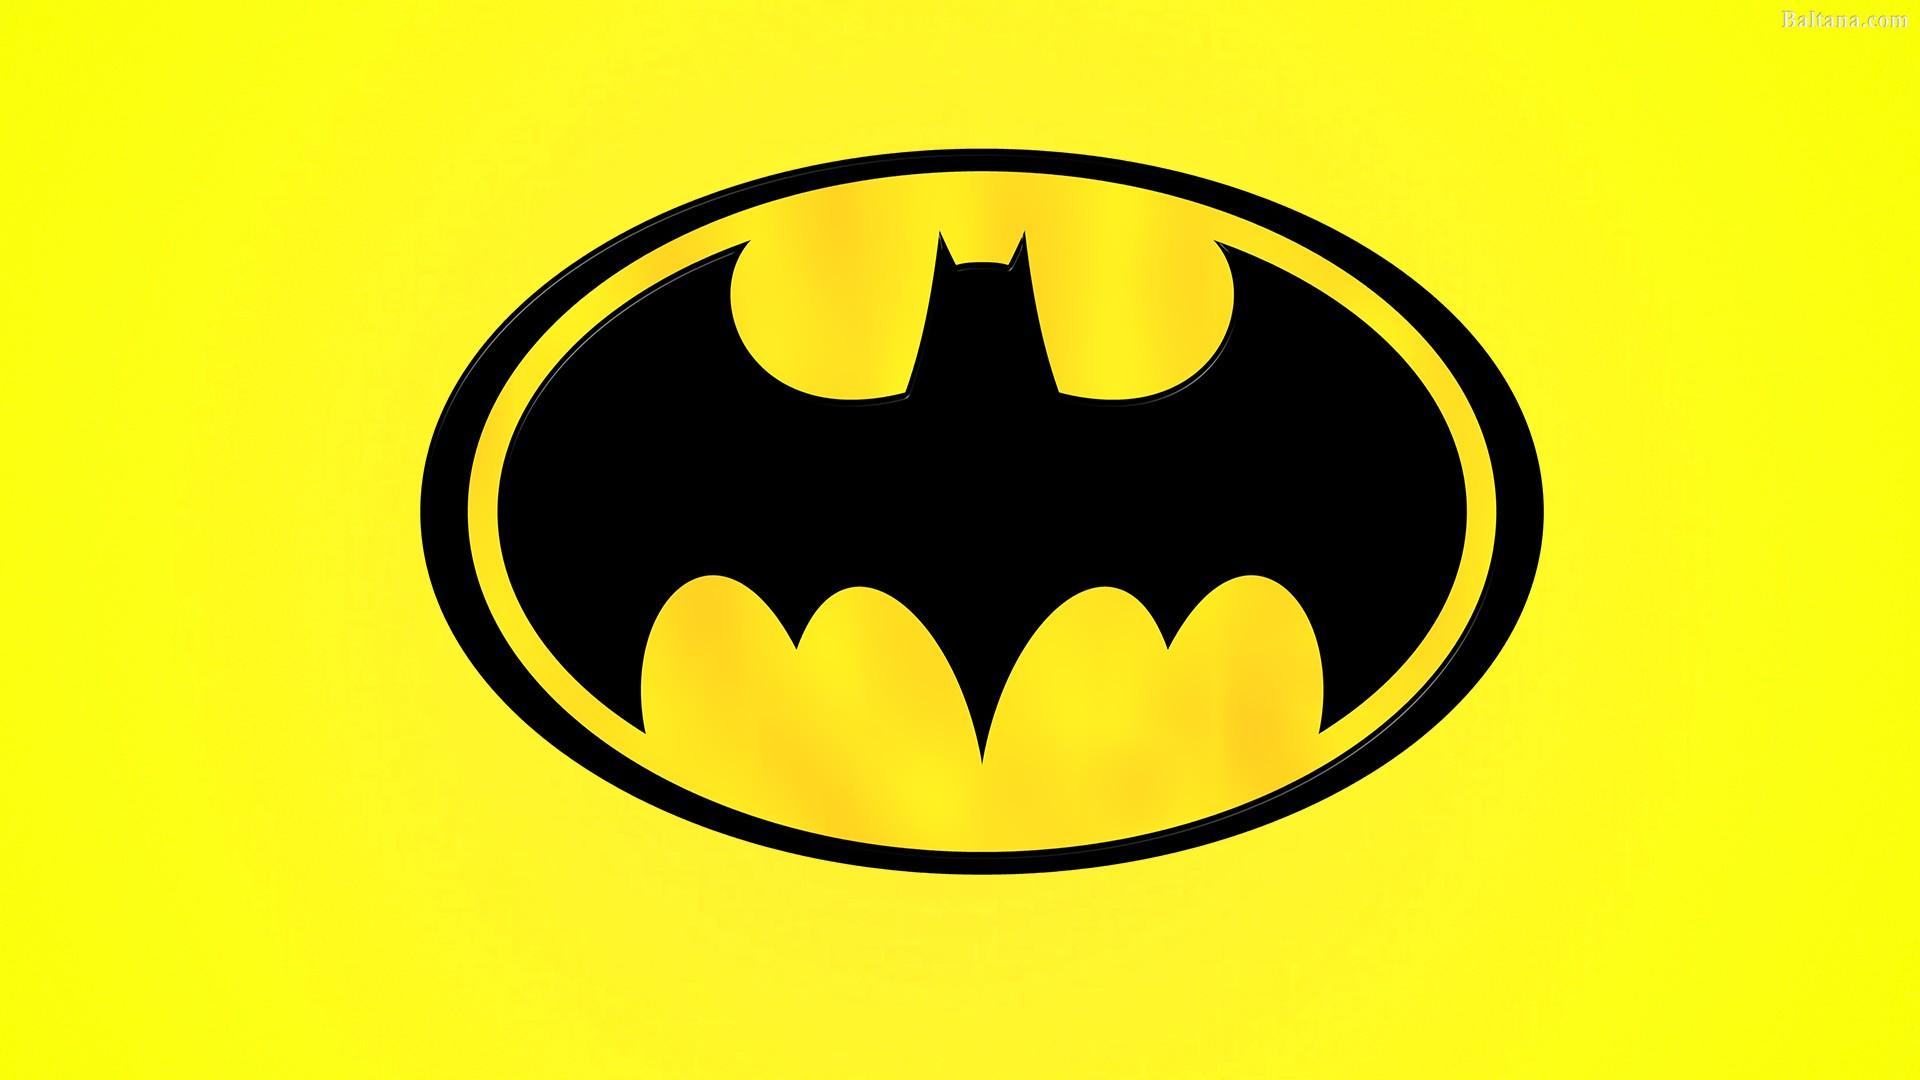 Batman Logo Hd Wallpapers.